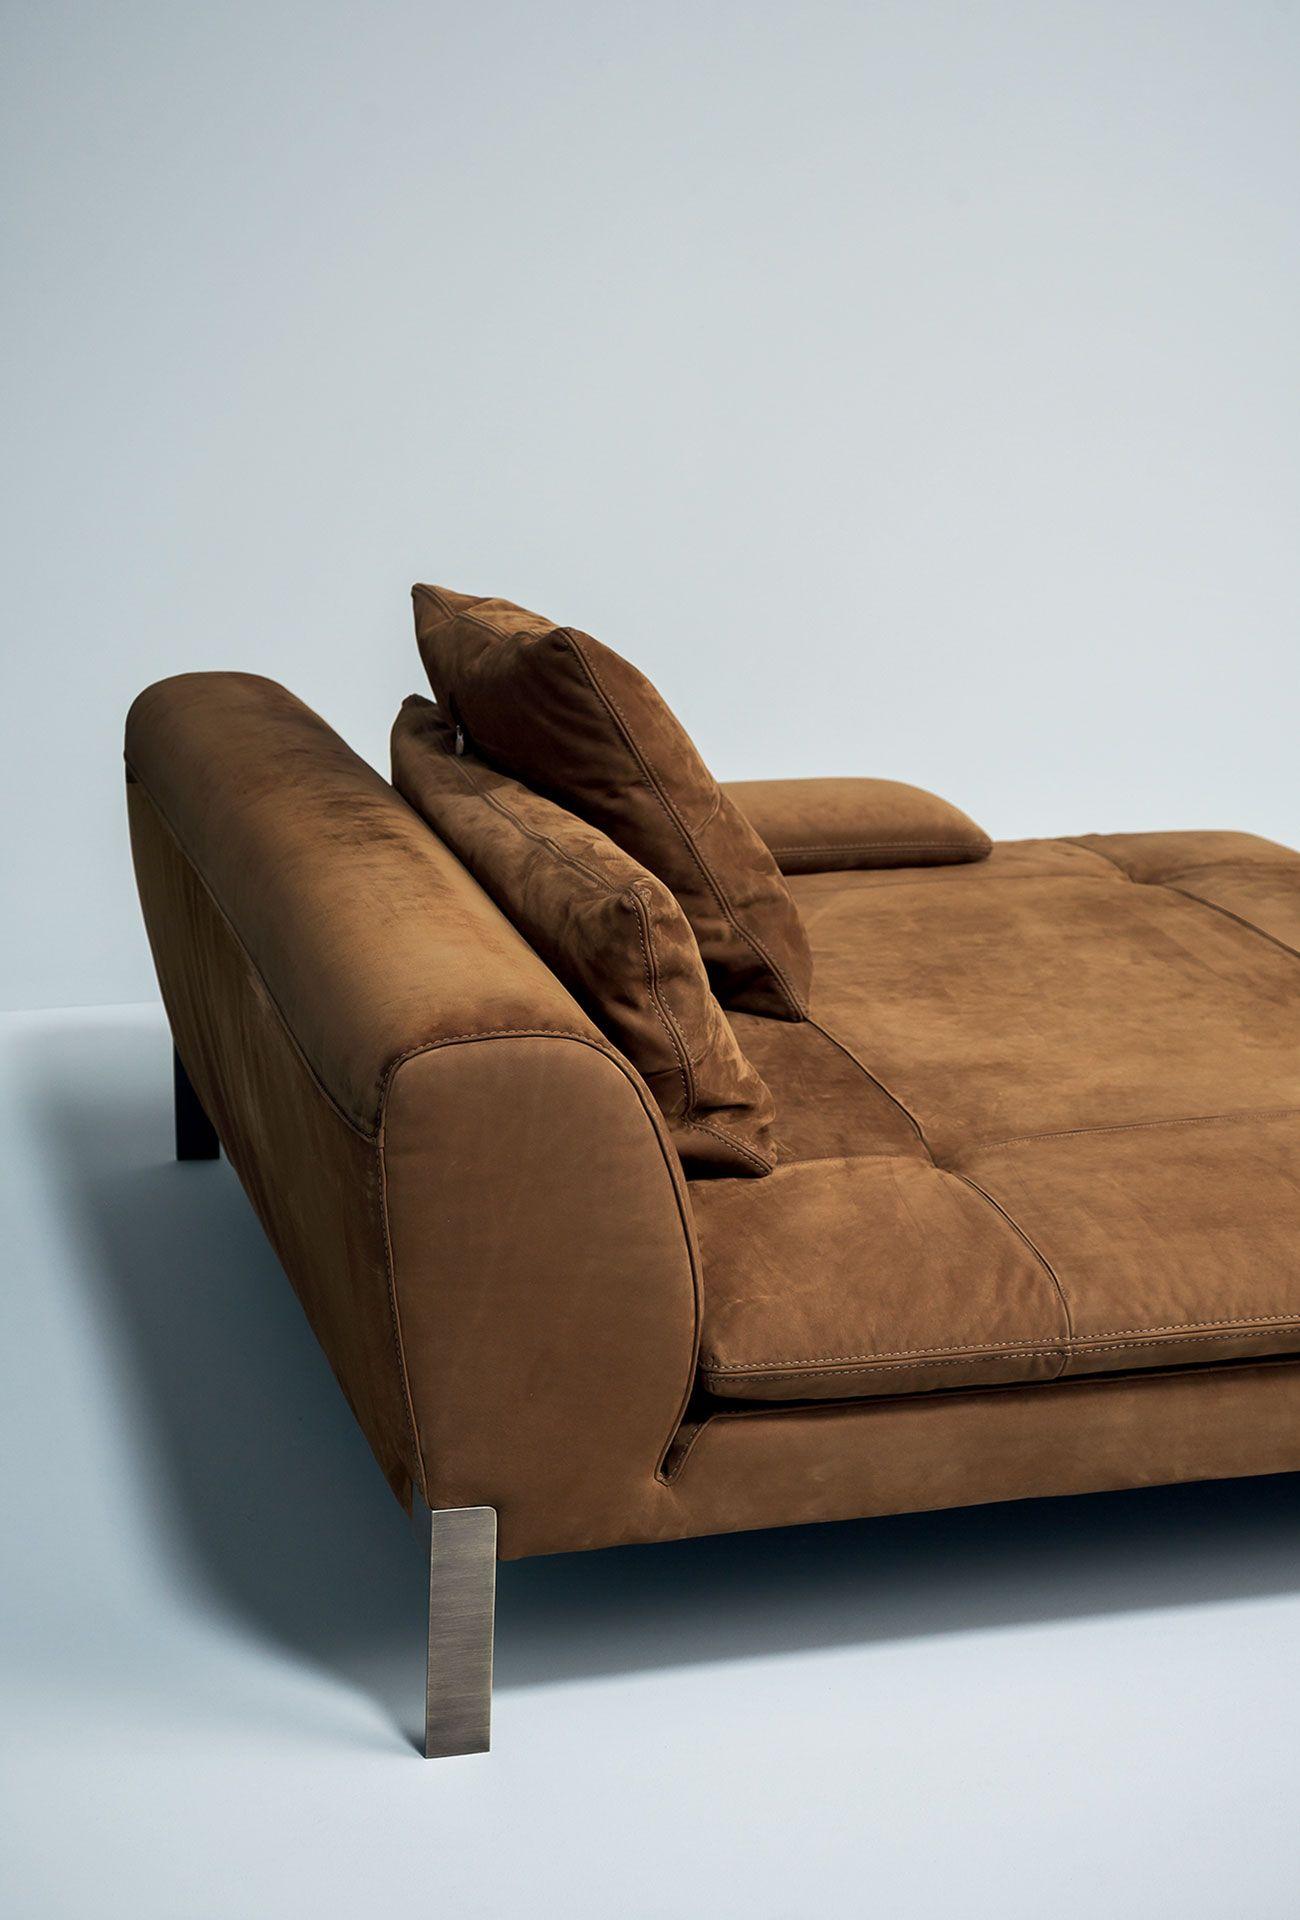 Divano In Pelle Con Recliner.Divano In Pelle Viktor Baxter Upholstered Furniture Sofa